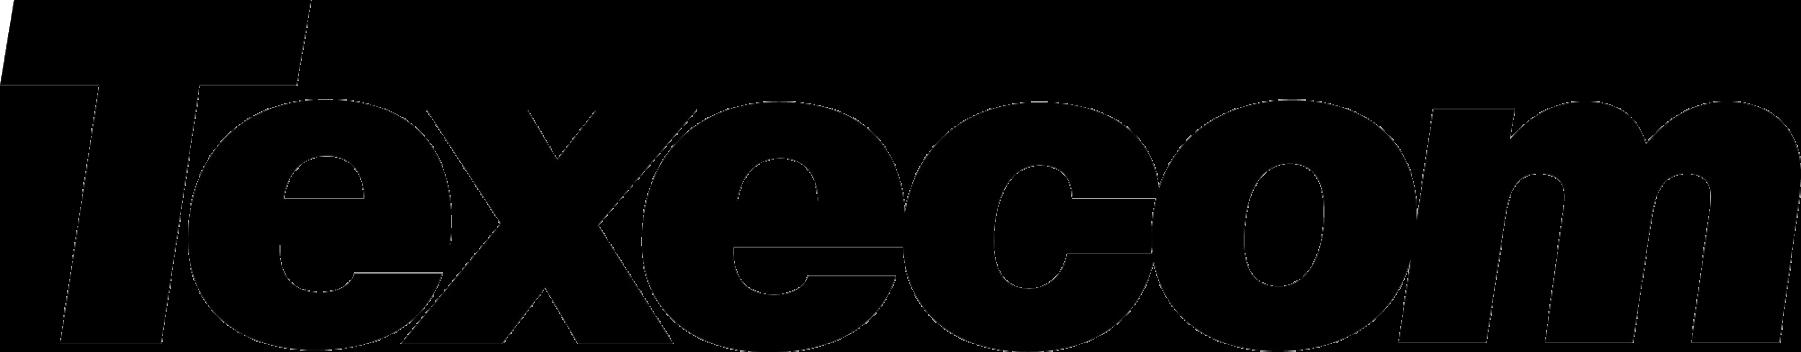 Texecom logo